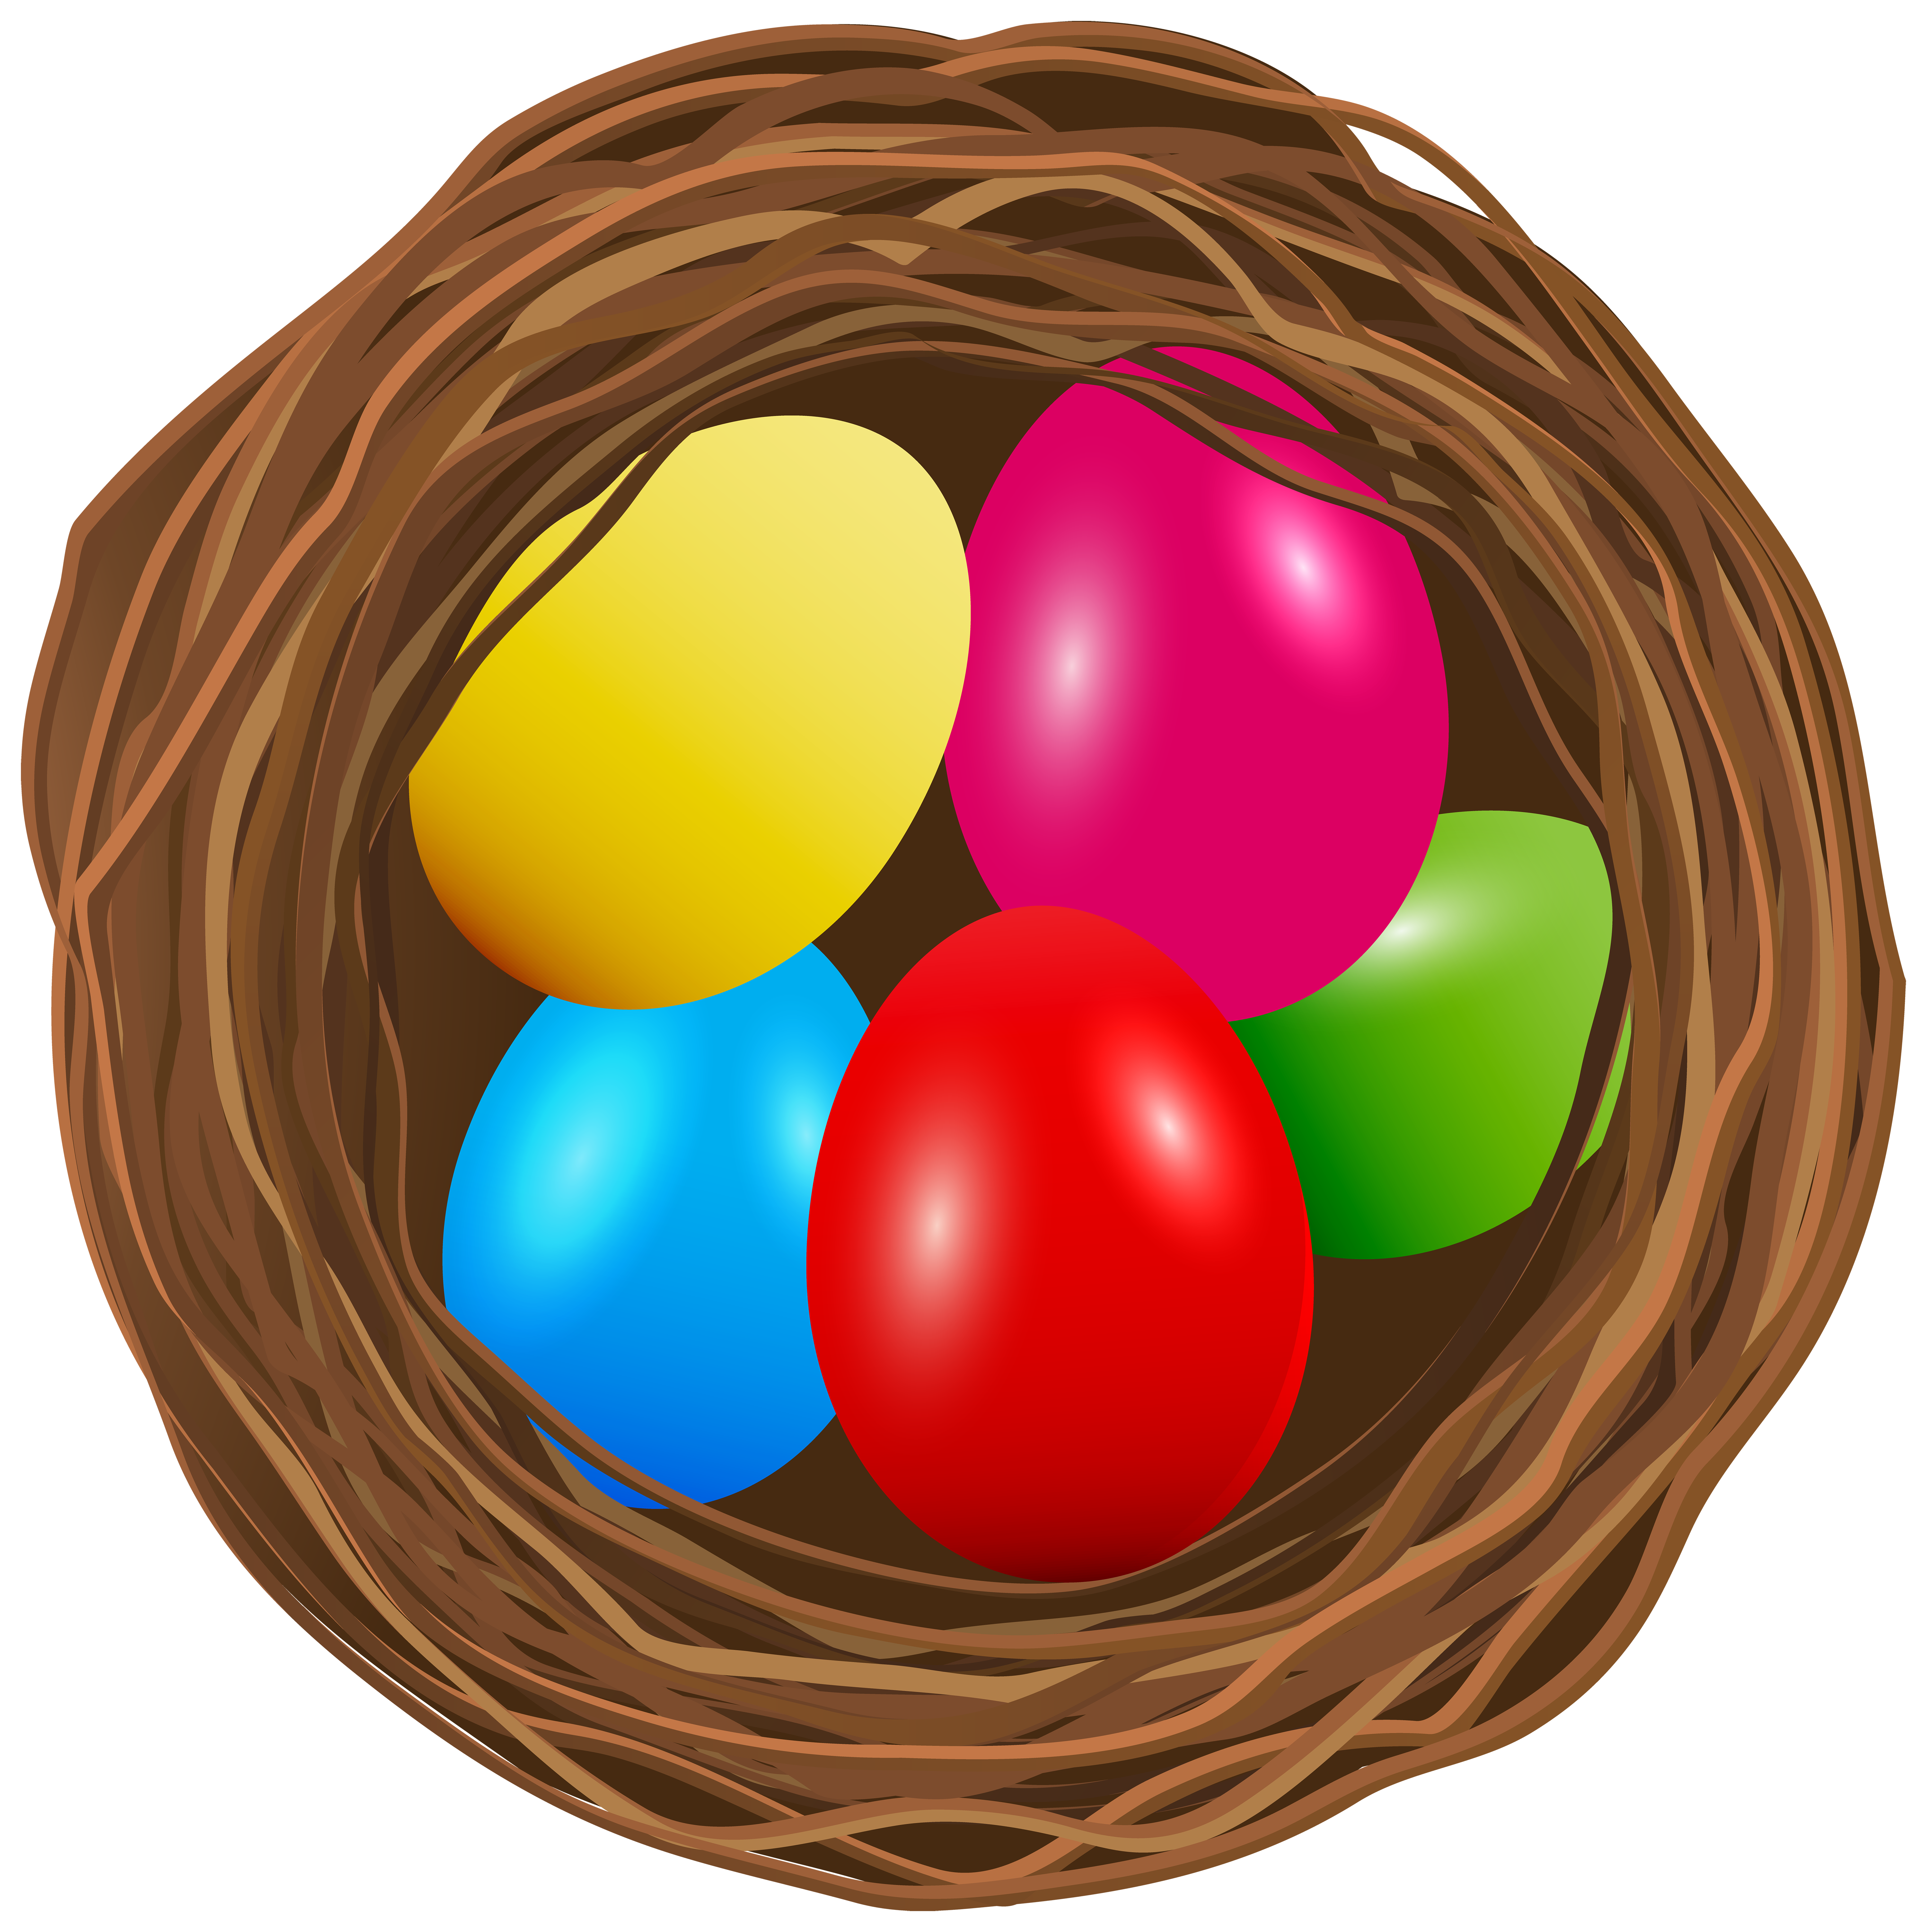 6000x6016 Easter Egg Nest Transparent Png Clip Art Imageu200b Gallery